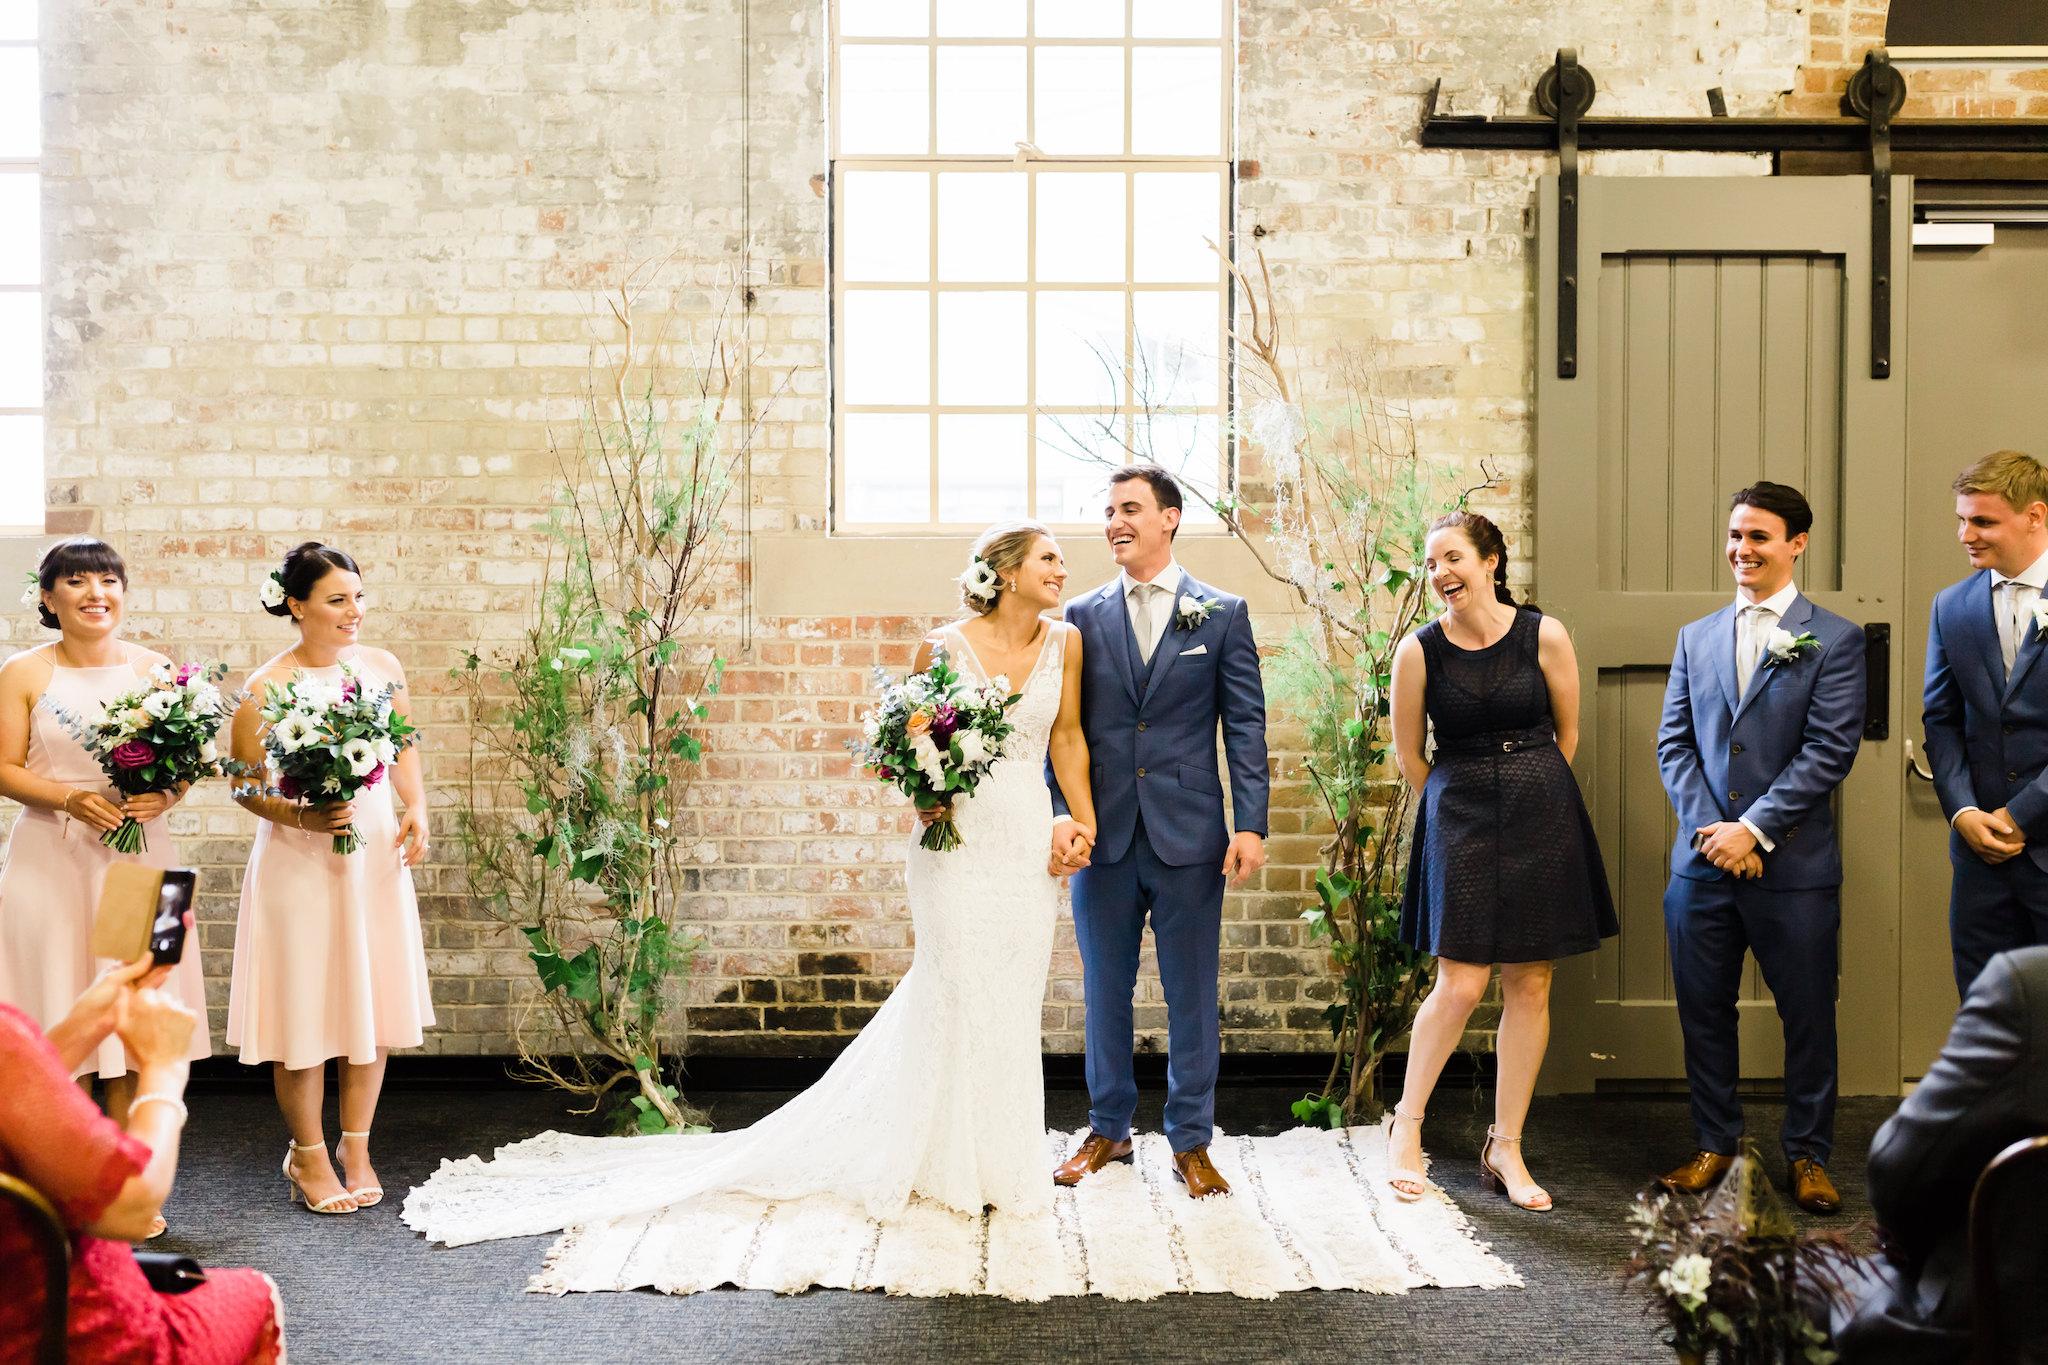 352-SOPHIE  DYLAN WEDDING.jpg